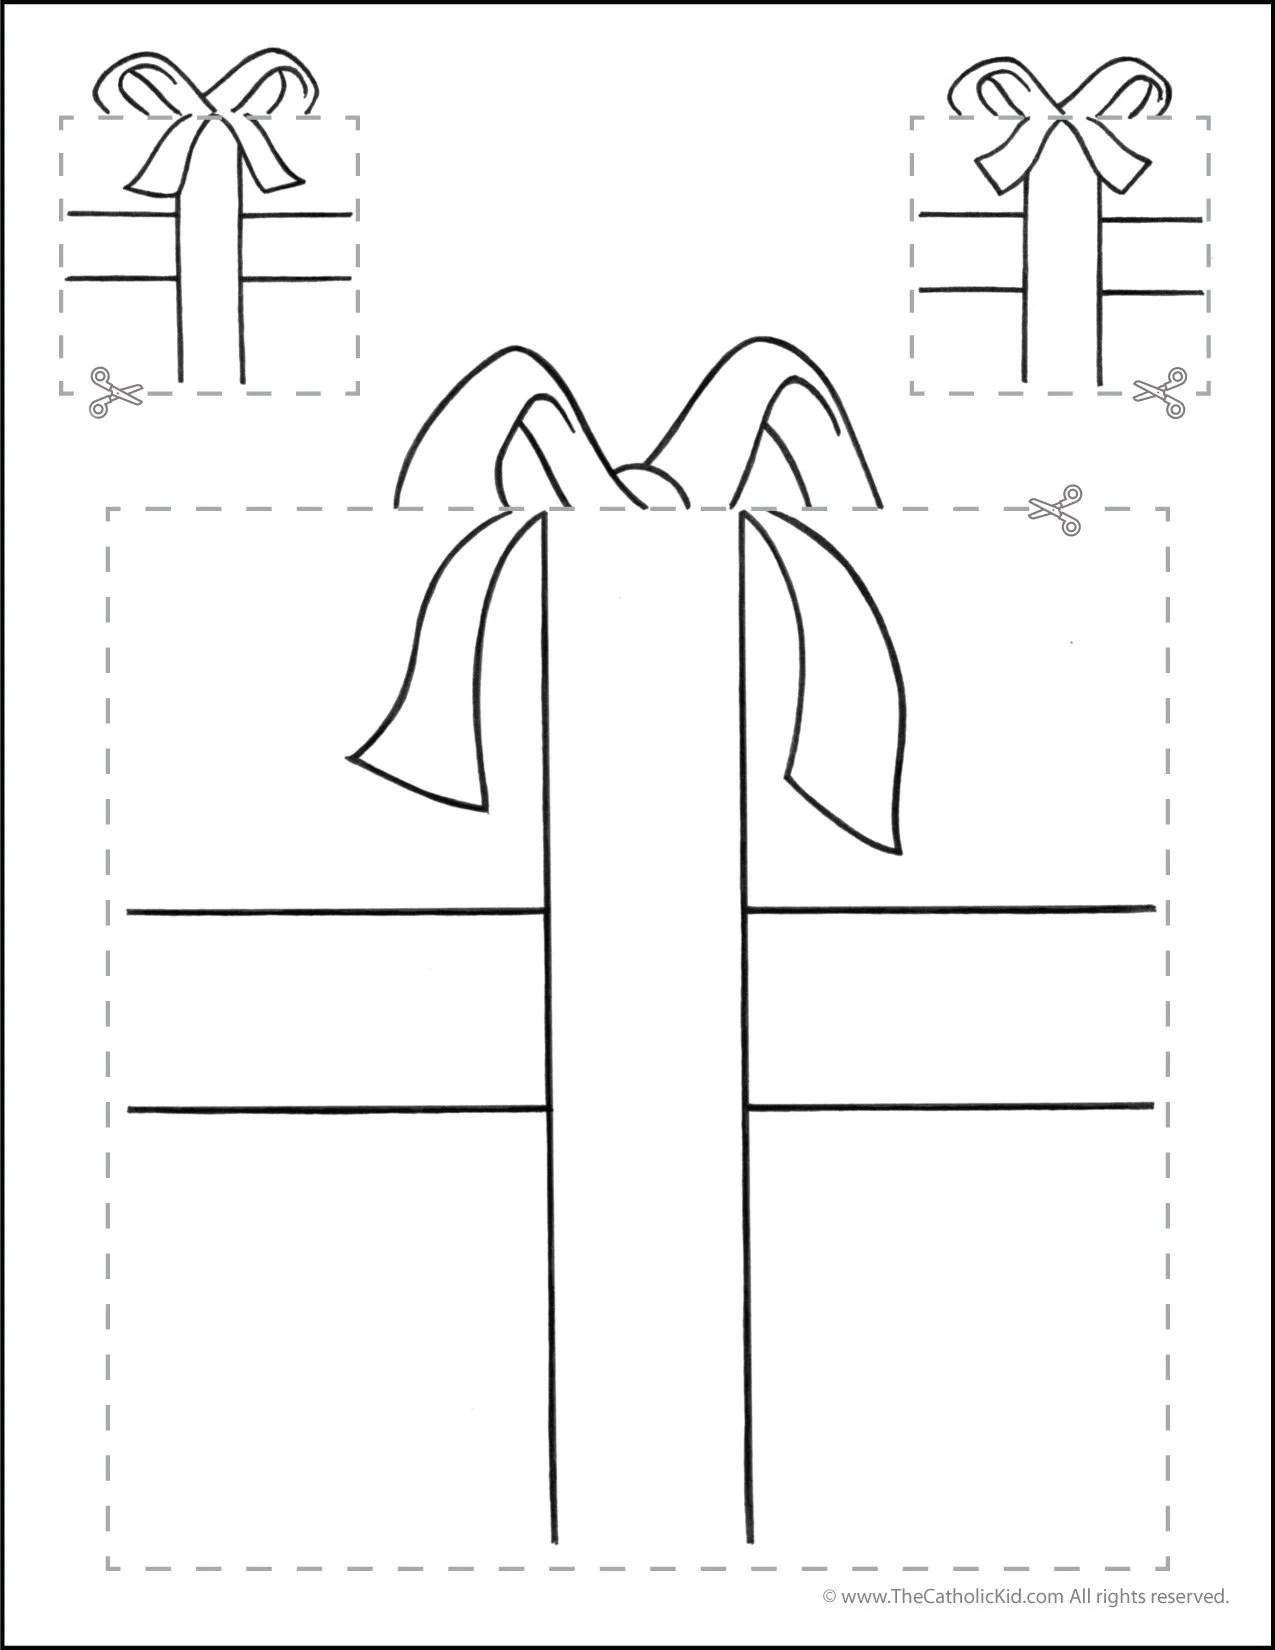 Cutting Practice Worksheet